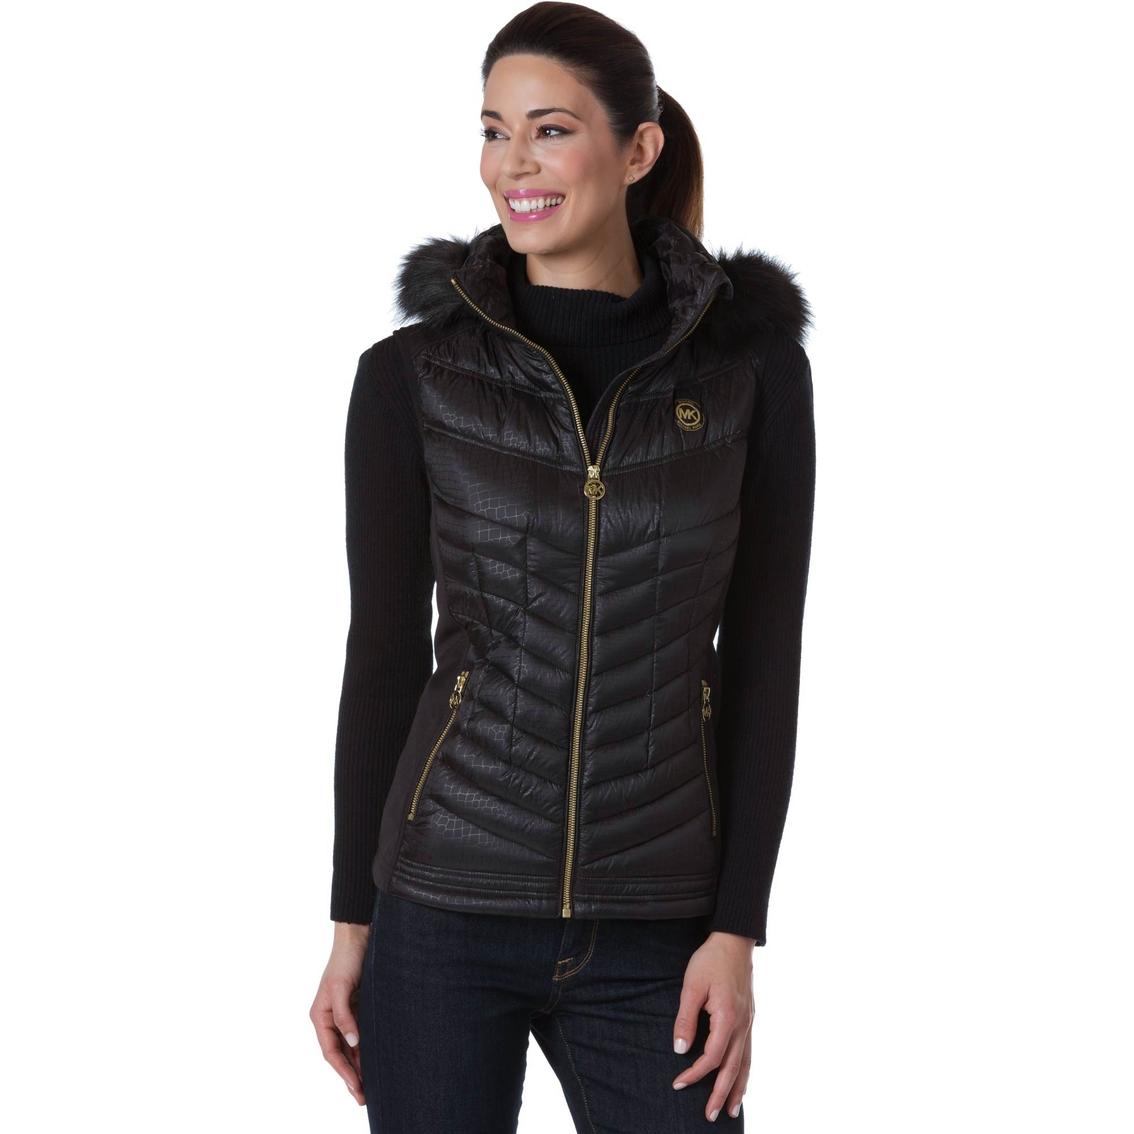 425fede5d466d7 Michael Kors Hooded Vest | Apparel | Shop The Exchange